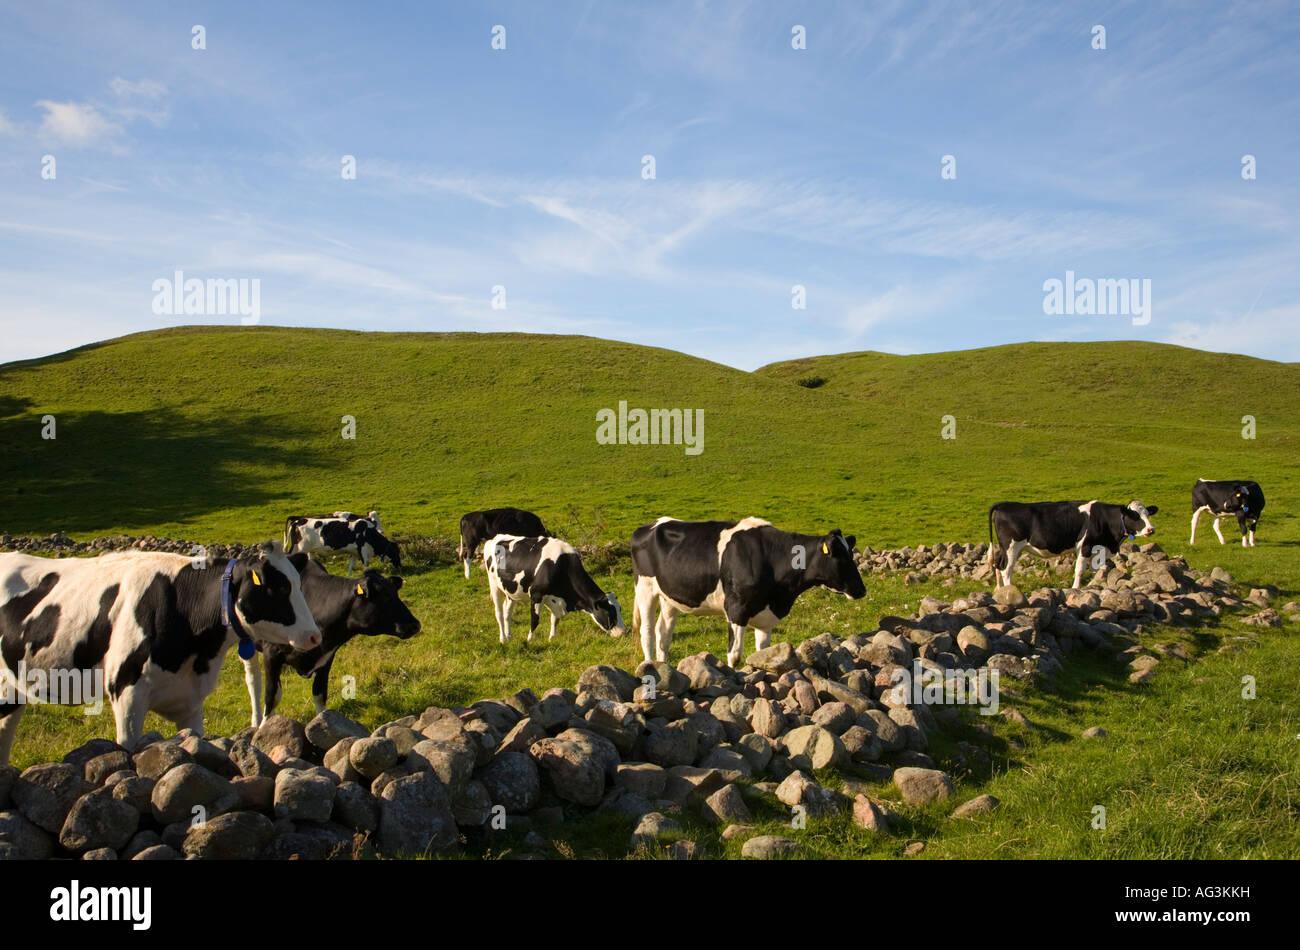 Sweden Skåne Scania Grevie Backar nature reserve grazing cattle September 2007 - Stock Image